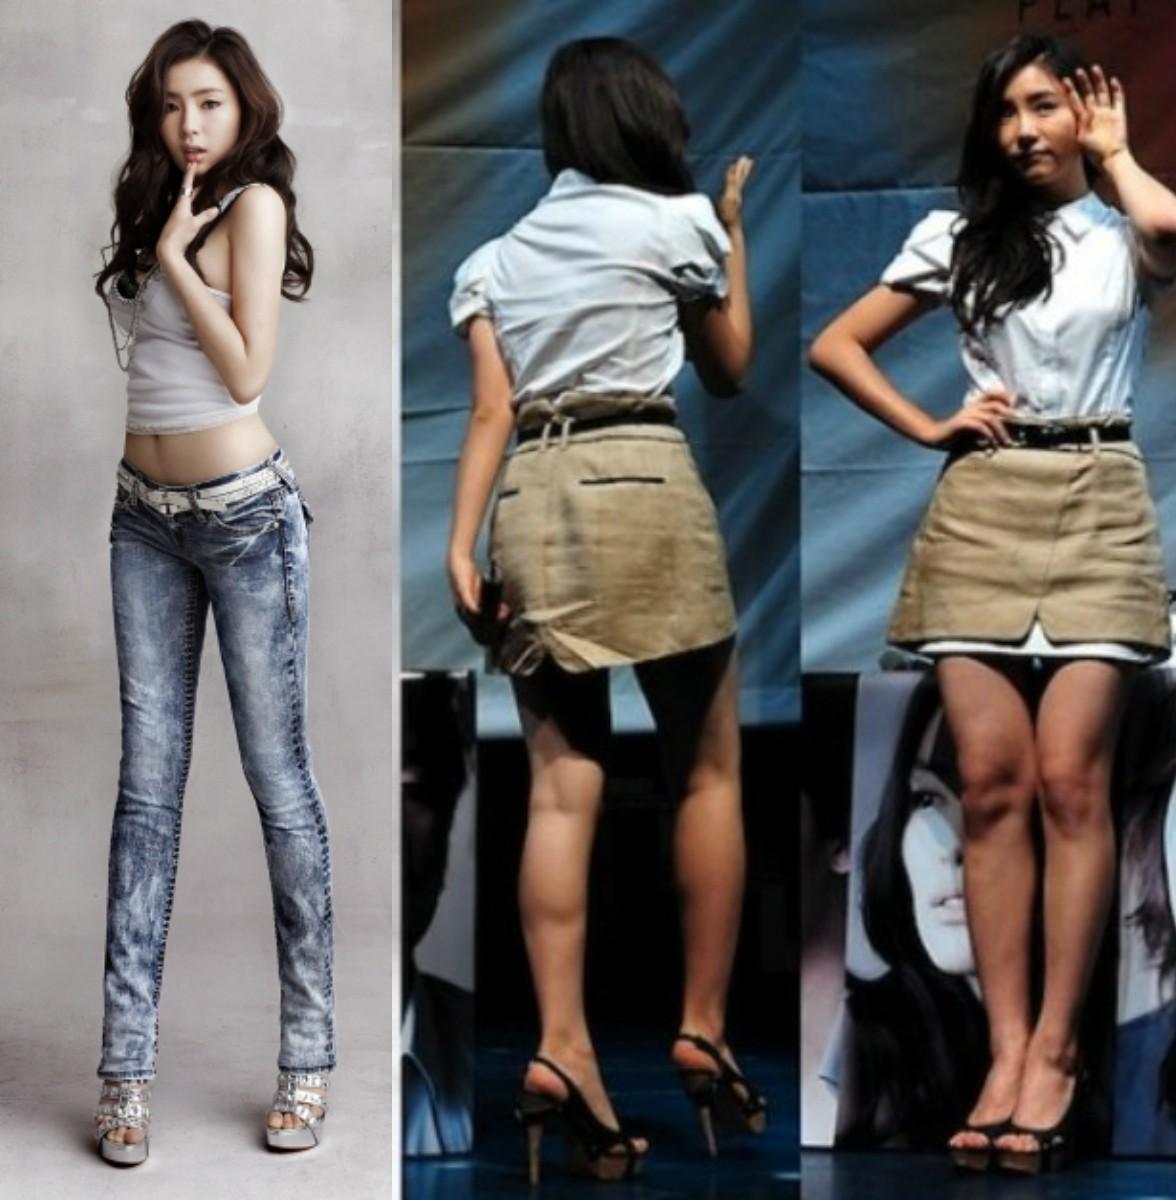 shin-se-kyung-2-15351660581141960200435.jpg